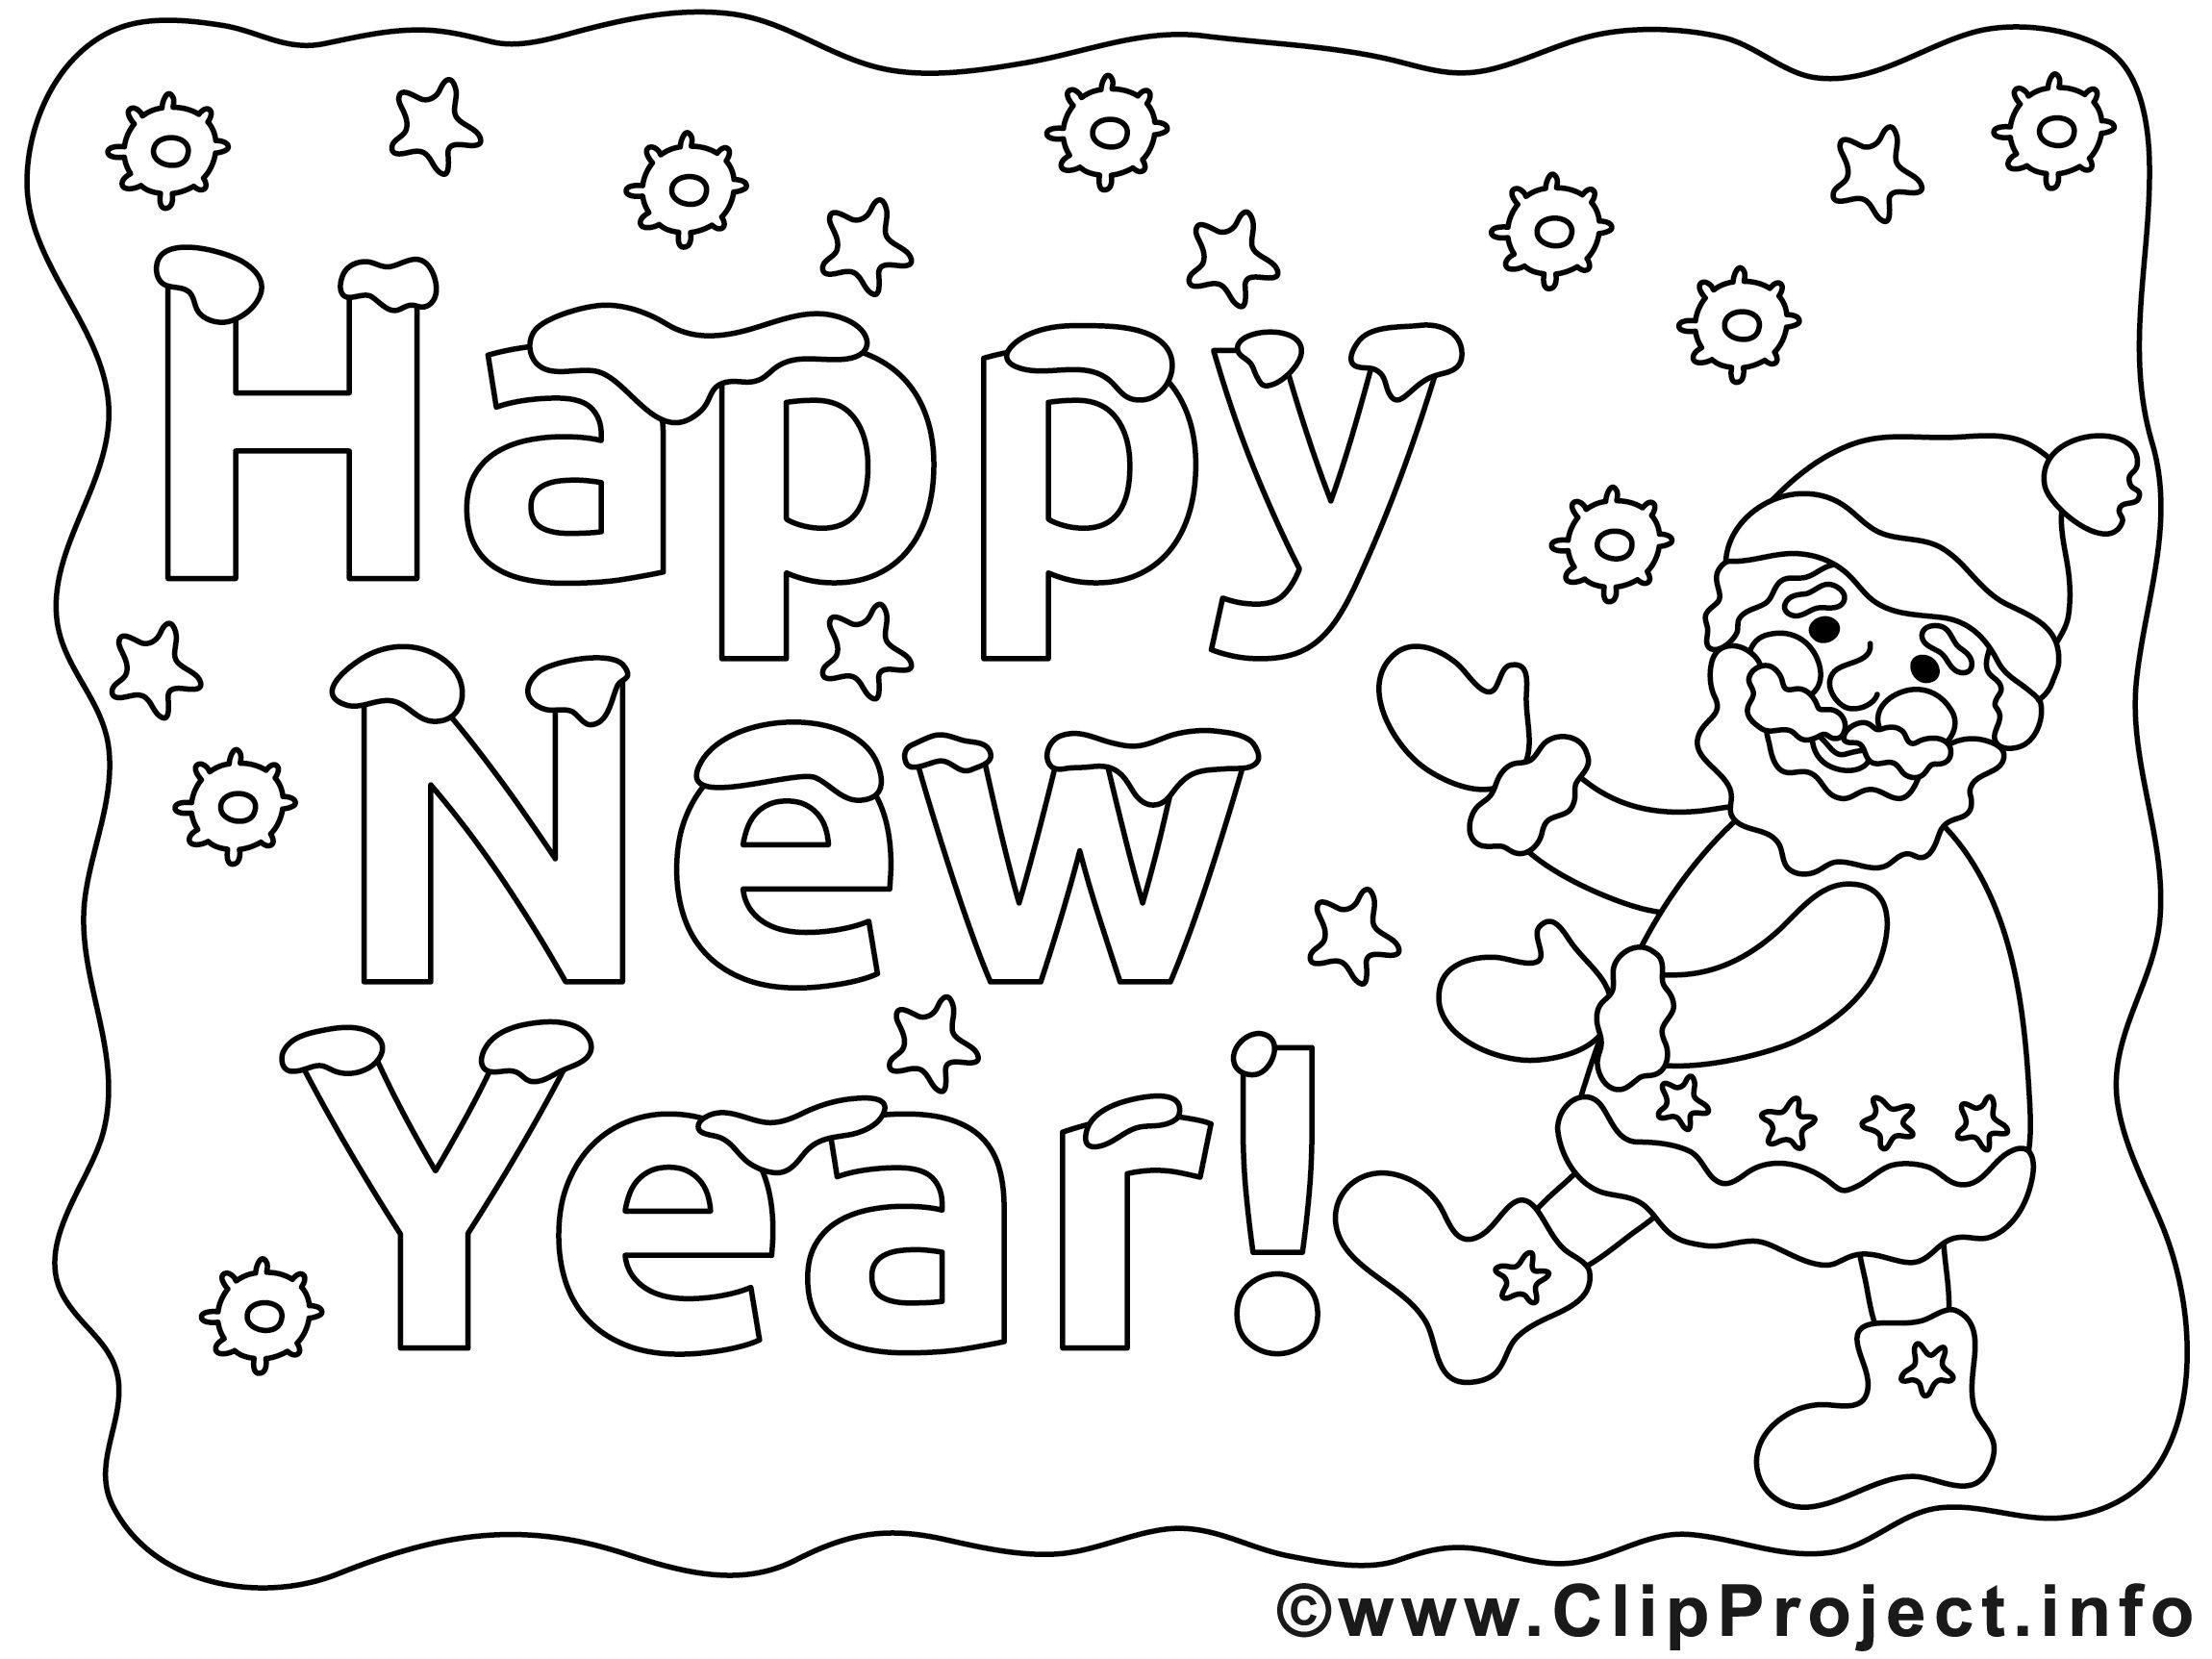 8+ Best Silvester ausmalbilder ideas  newyear, new year coloring